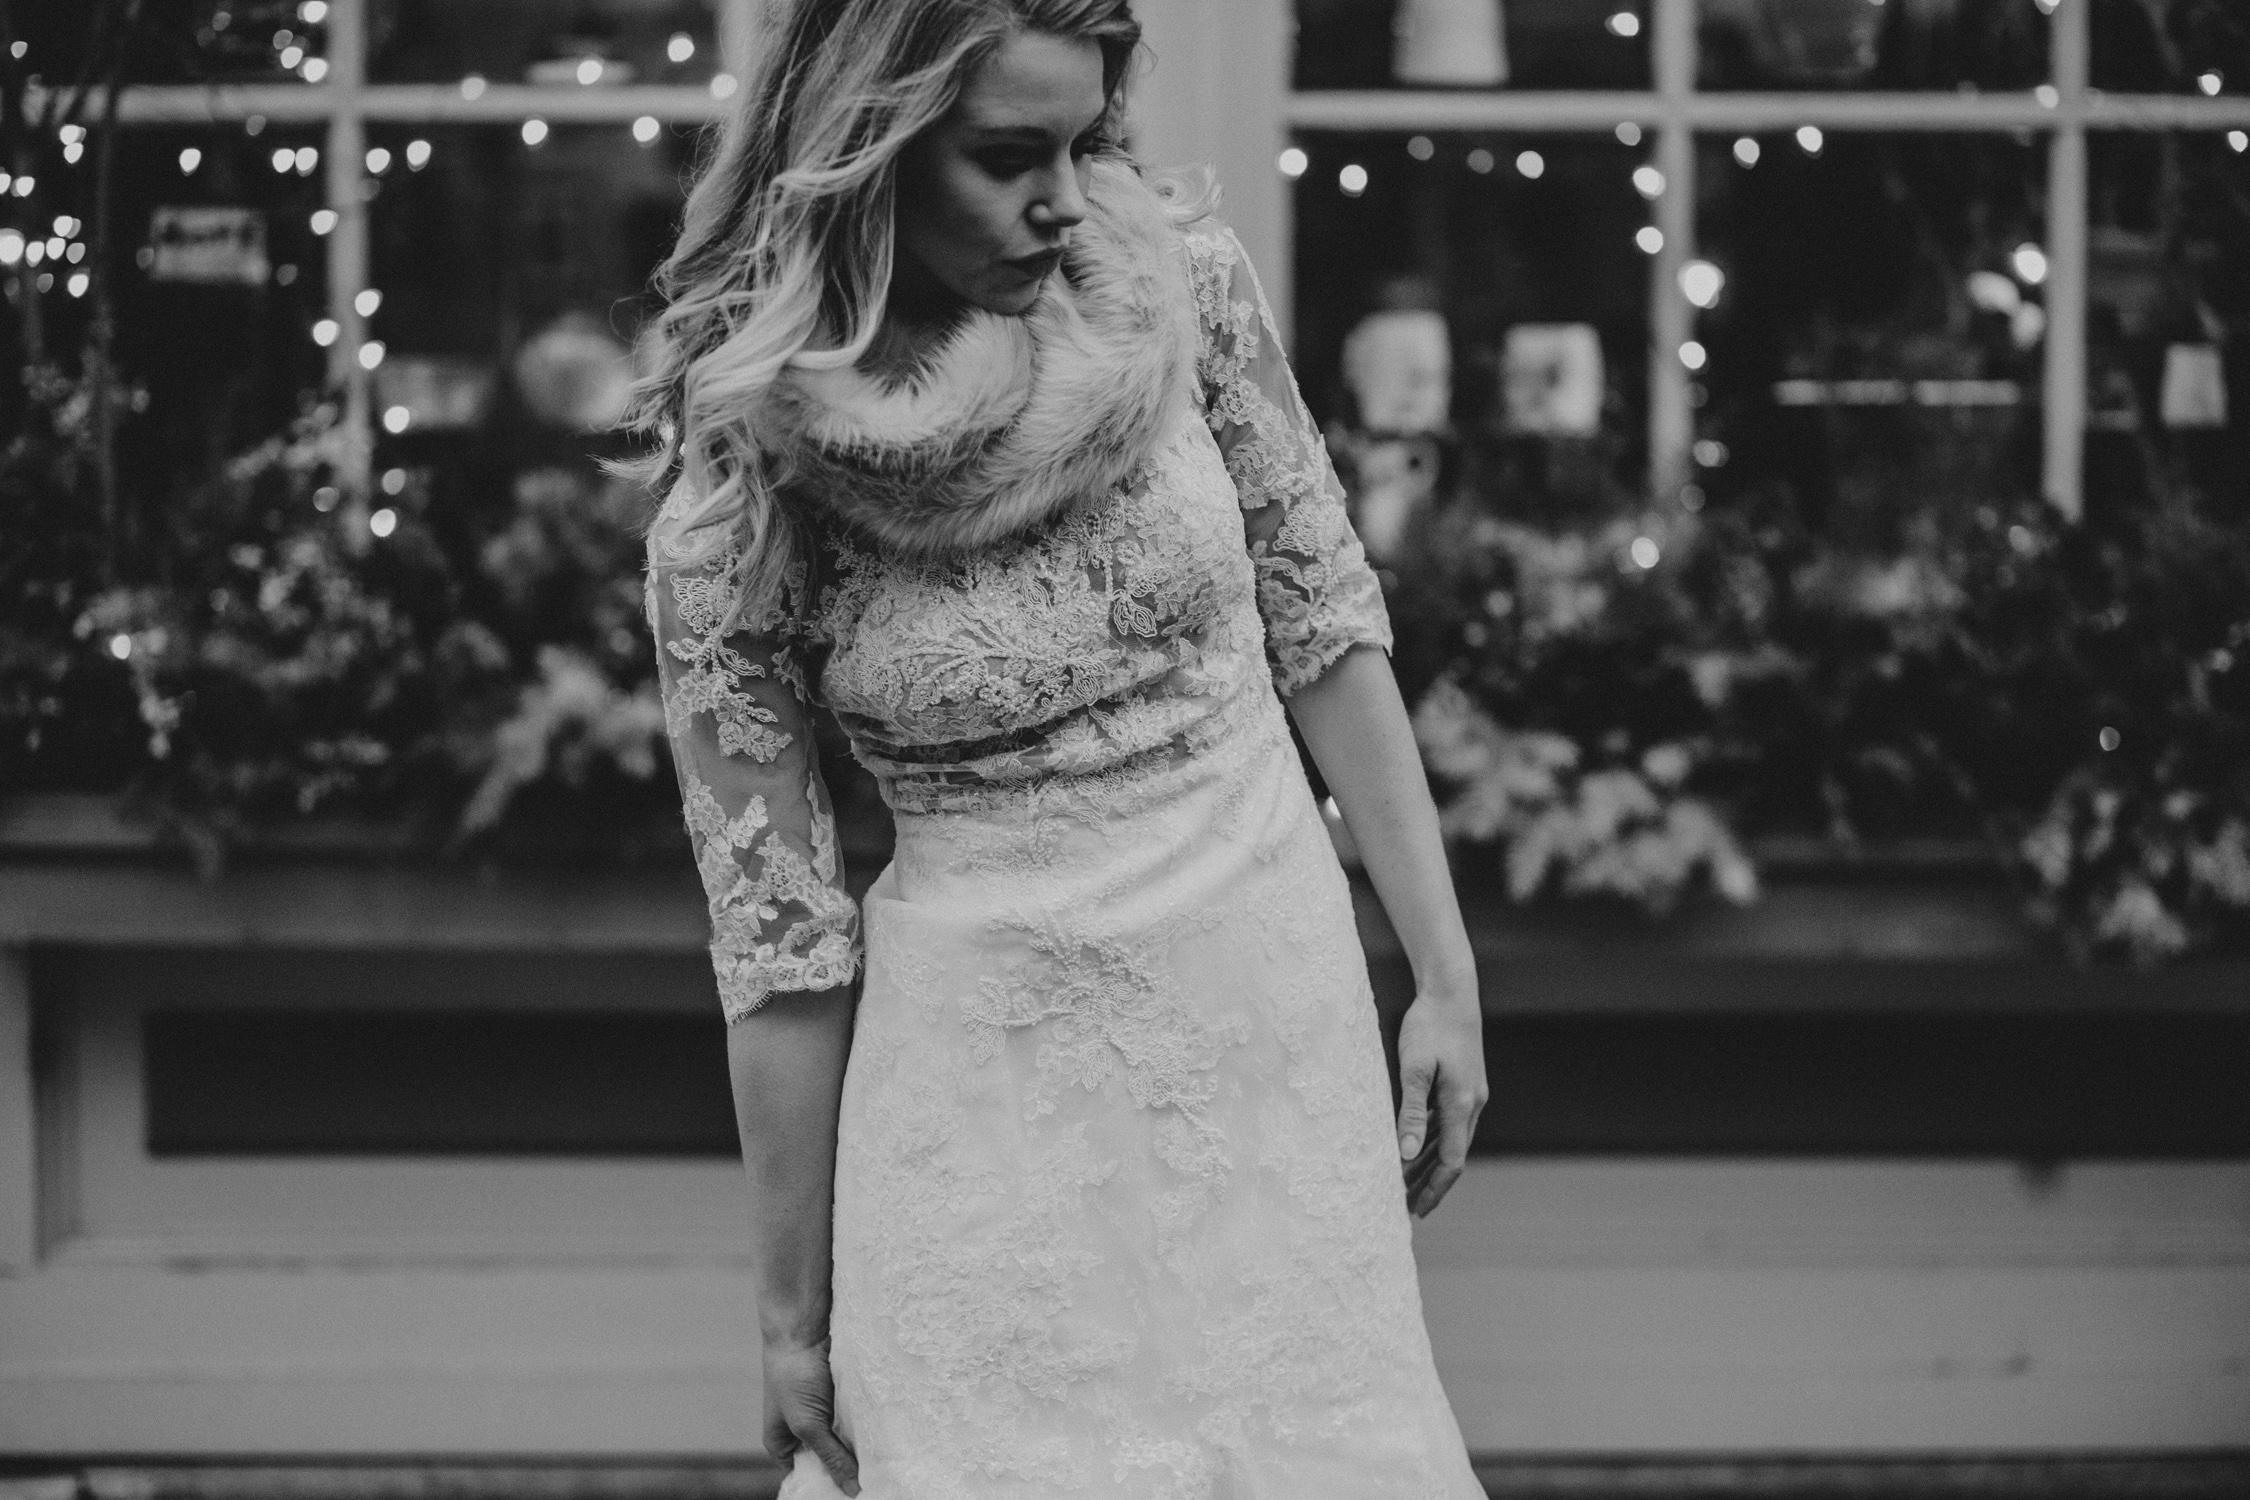 lucas_confectionery_wedding_008.jpg